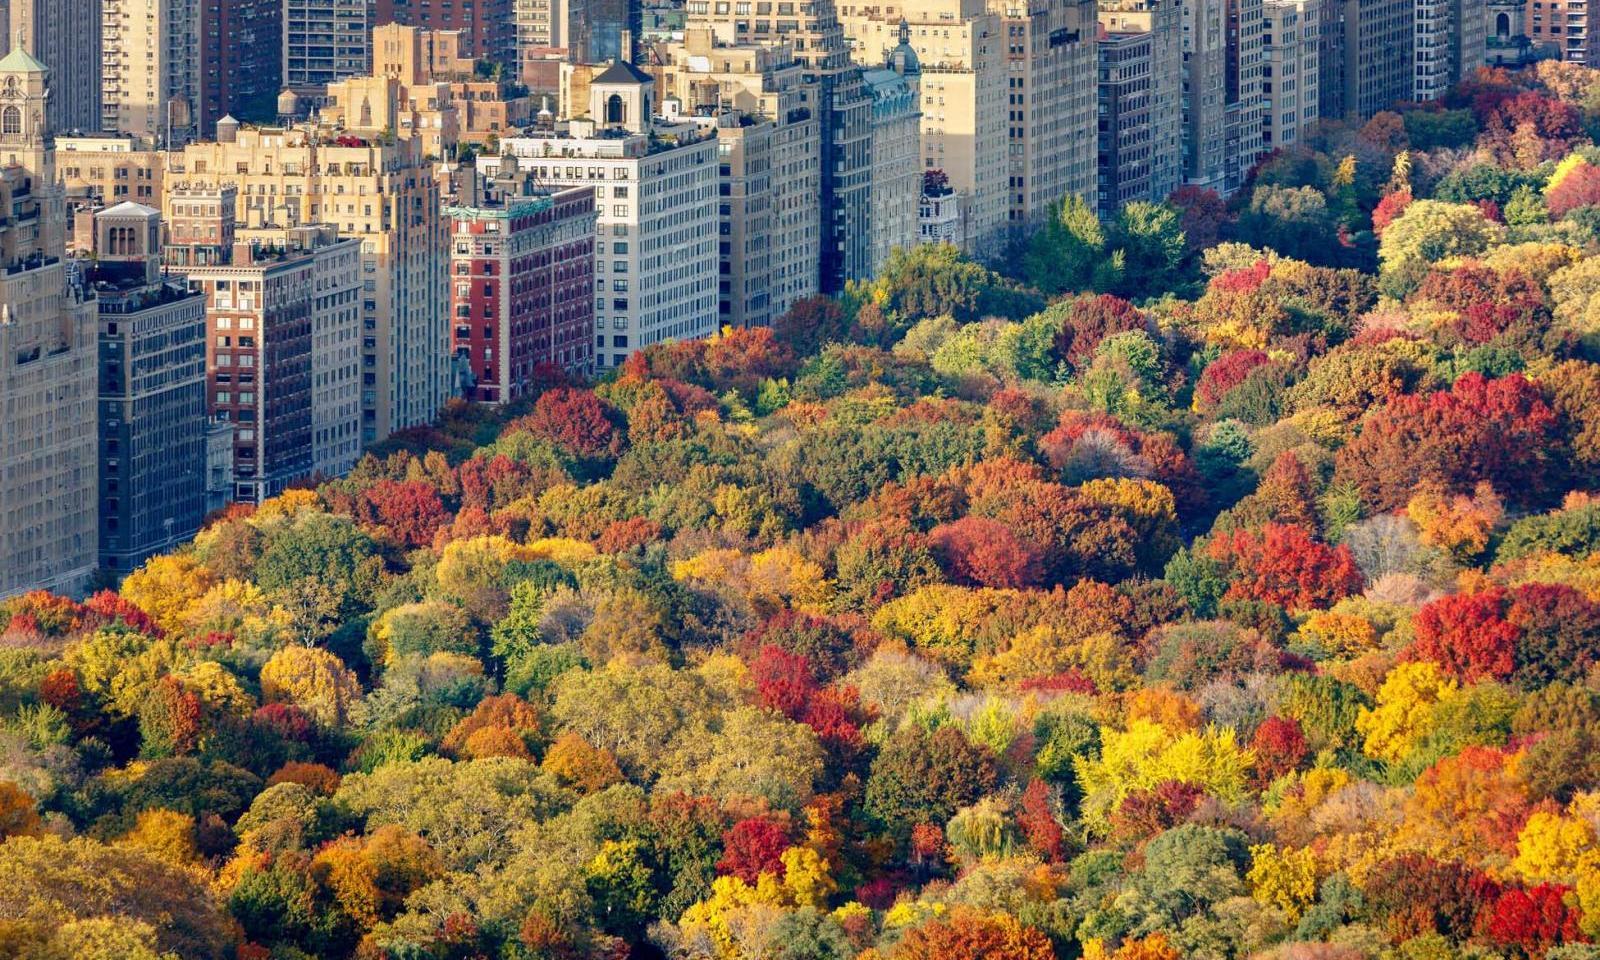 Fall-in-New-York_160909164547018-1600x960.jpg